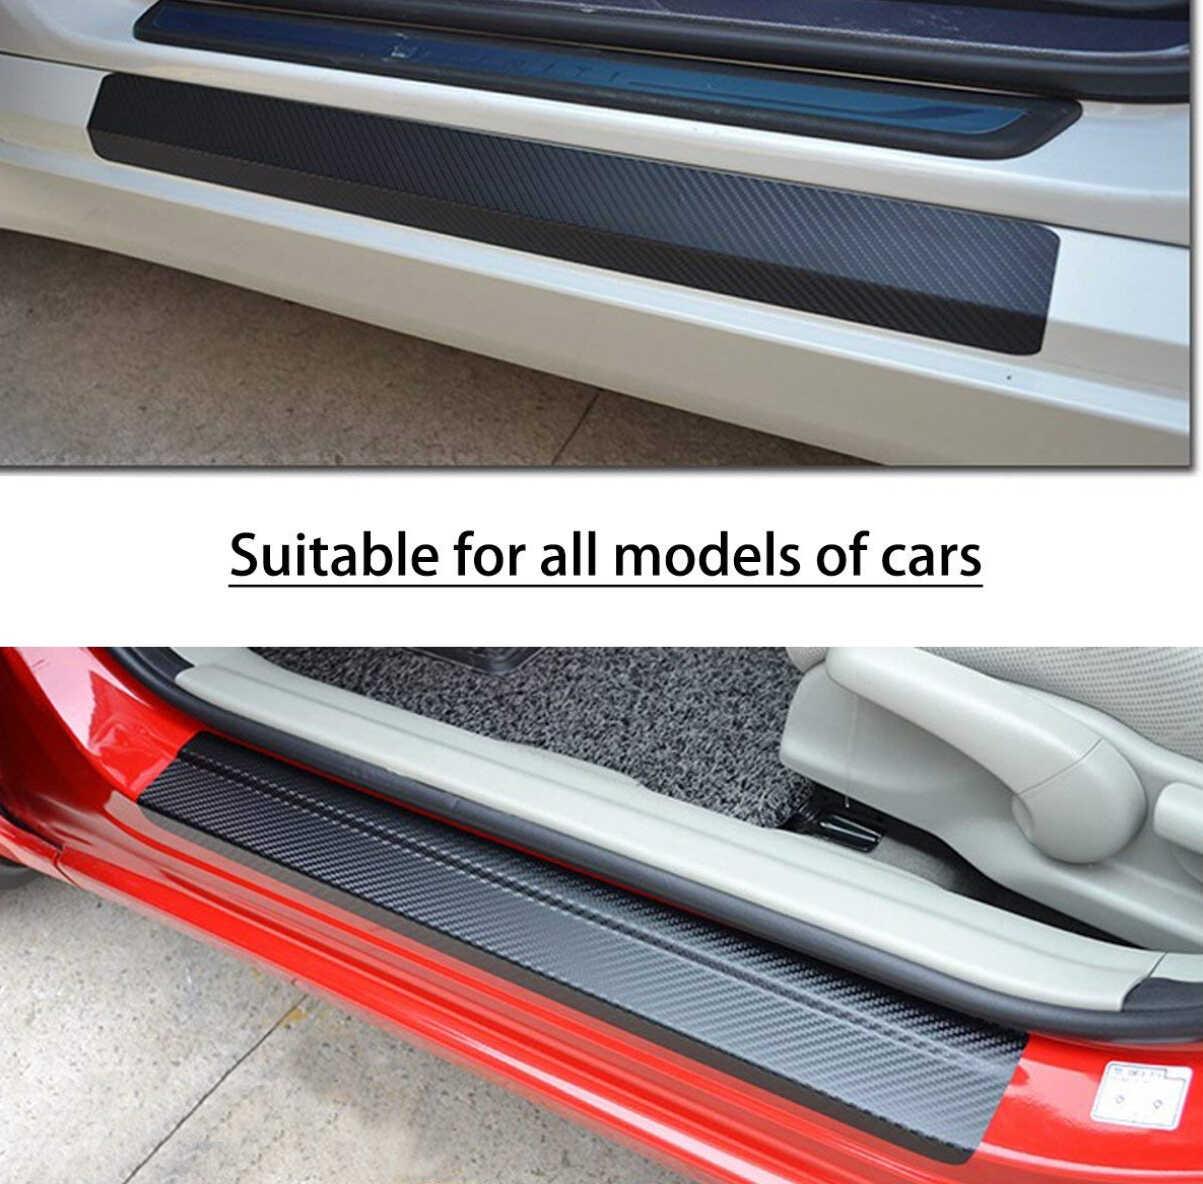 Cửa Xe Scuff Tấm Dán Vinyl Decalfor Megane Ghế Leon 1 Suzuki Samurai Audi A3 8 V VW Passat B6 xe Mazda 6 BMW R1200GS